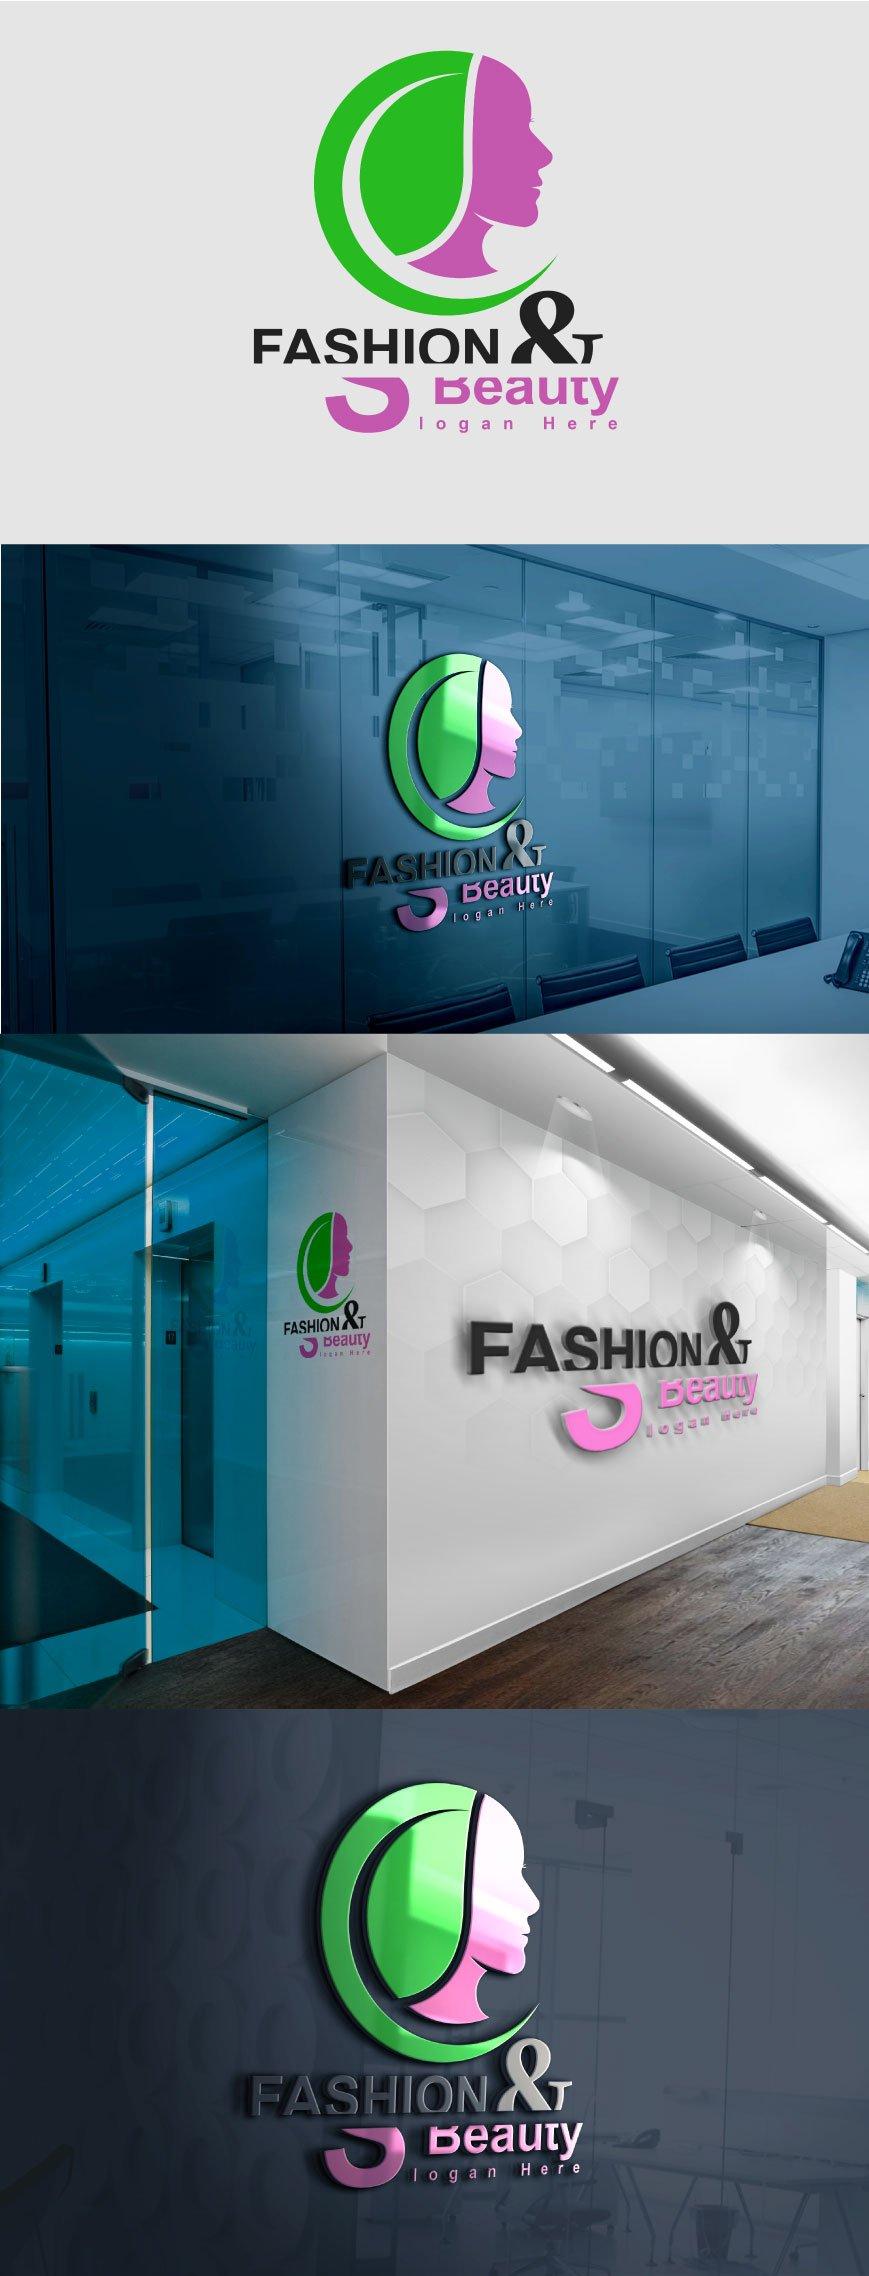 Fashion and beauty logo template